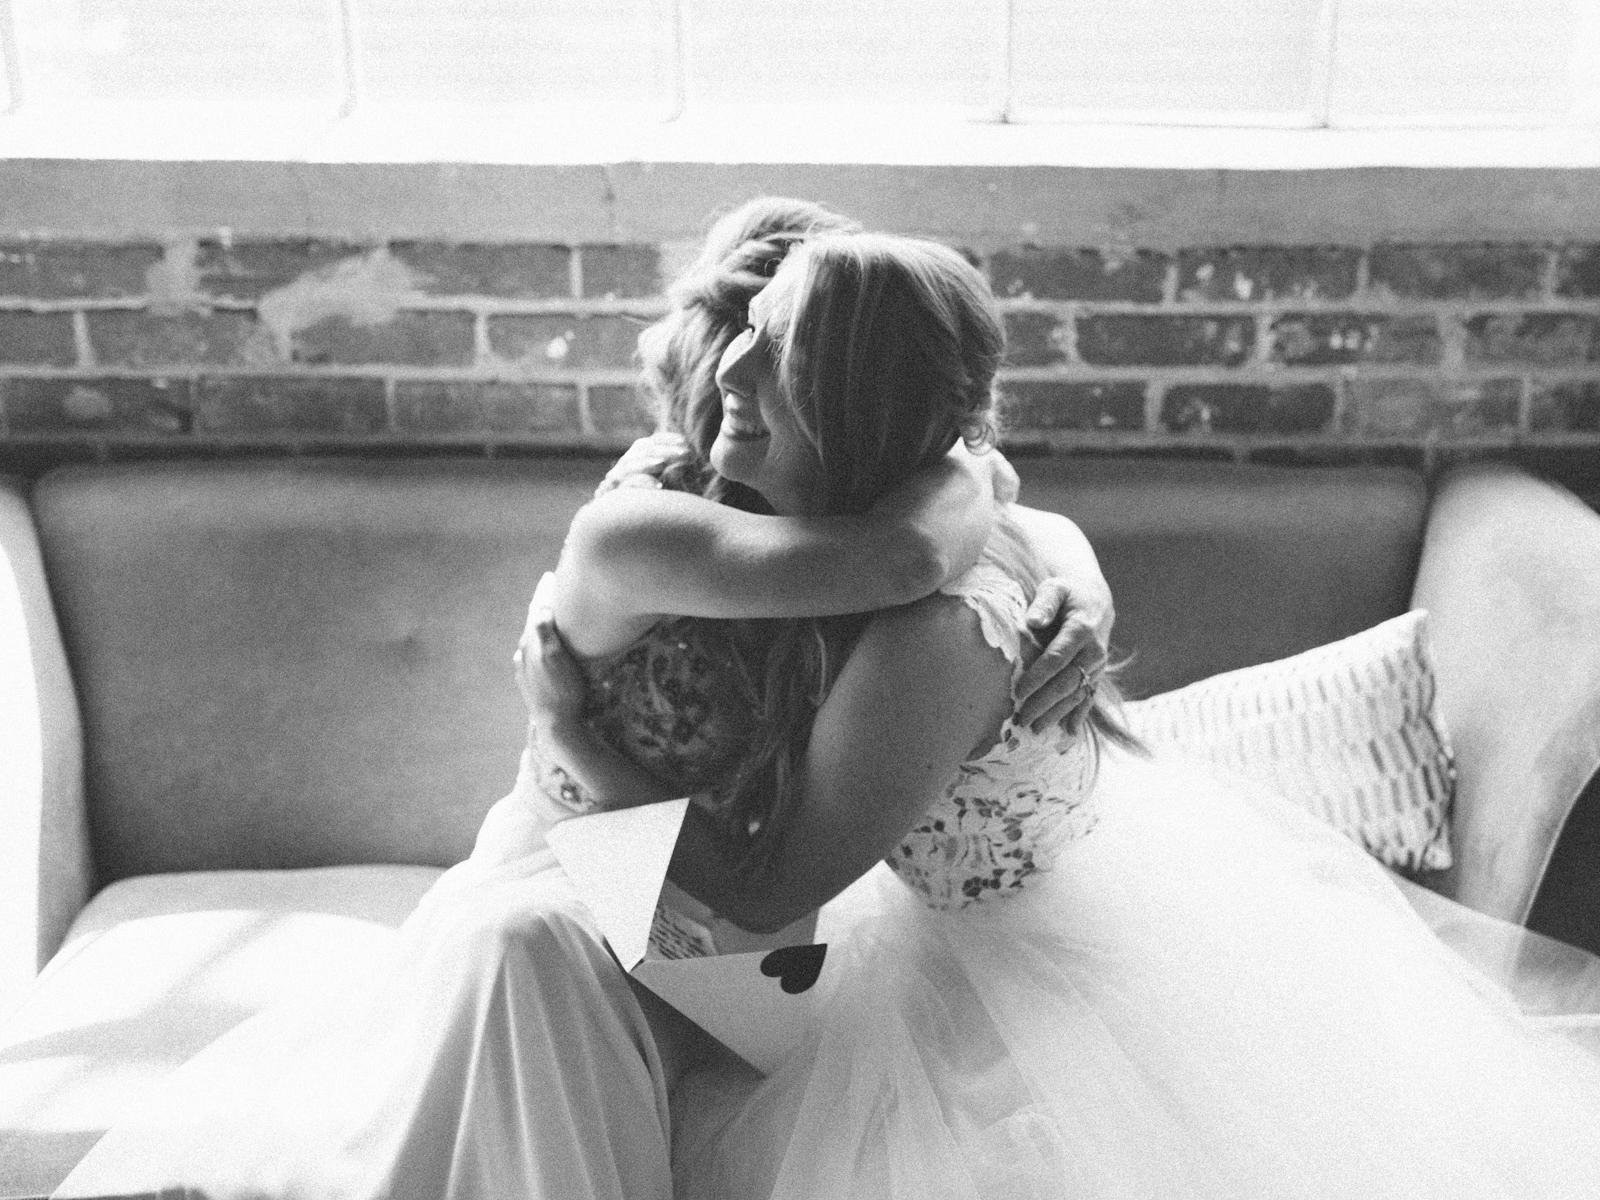 Foundry-At-Puritan-Mill-wedding-photos-venue-atlanta-fine-art-film-photographer12.JPG